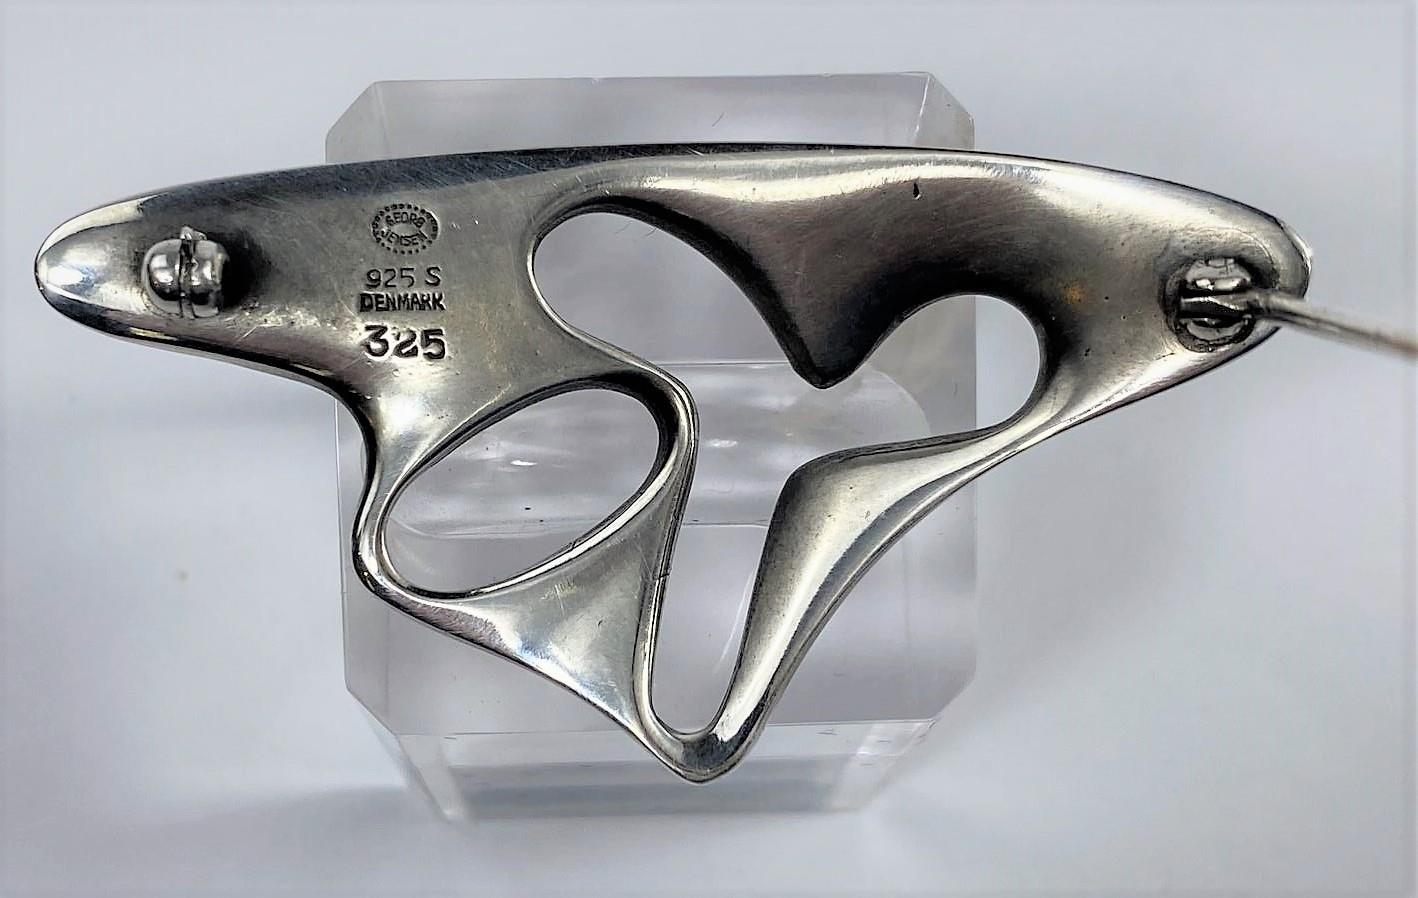 A Georg Jensen silver amoeba brooch designed by Henning Koppel, No 325, stamped marks, width 5.5 cm - Image 2 of 2